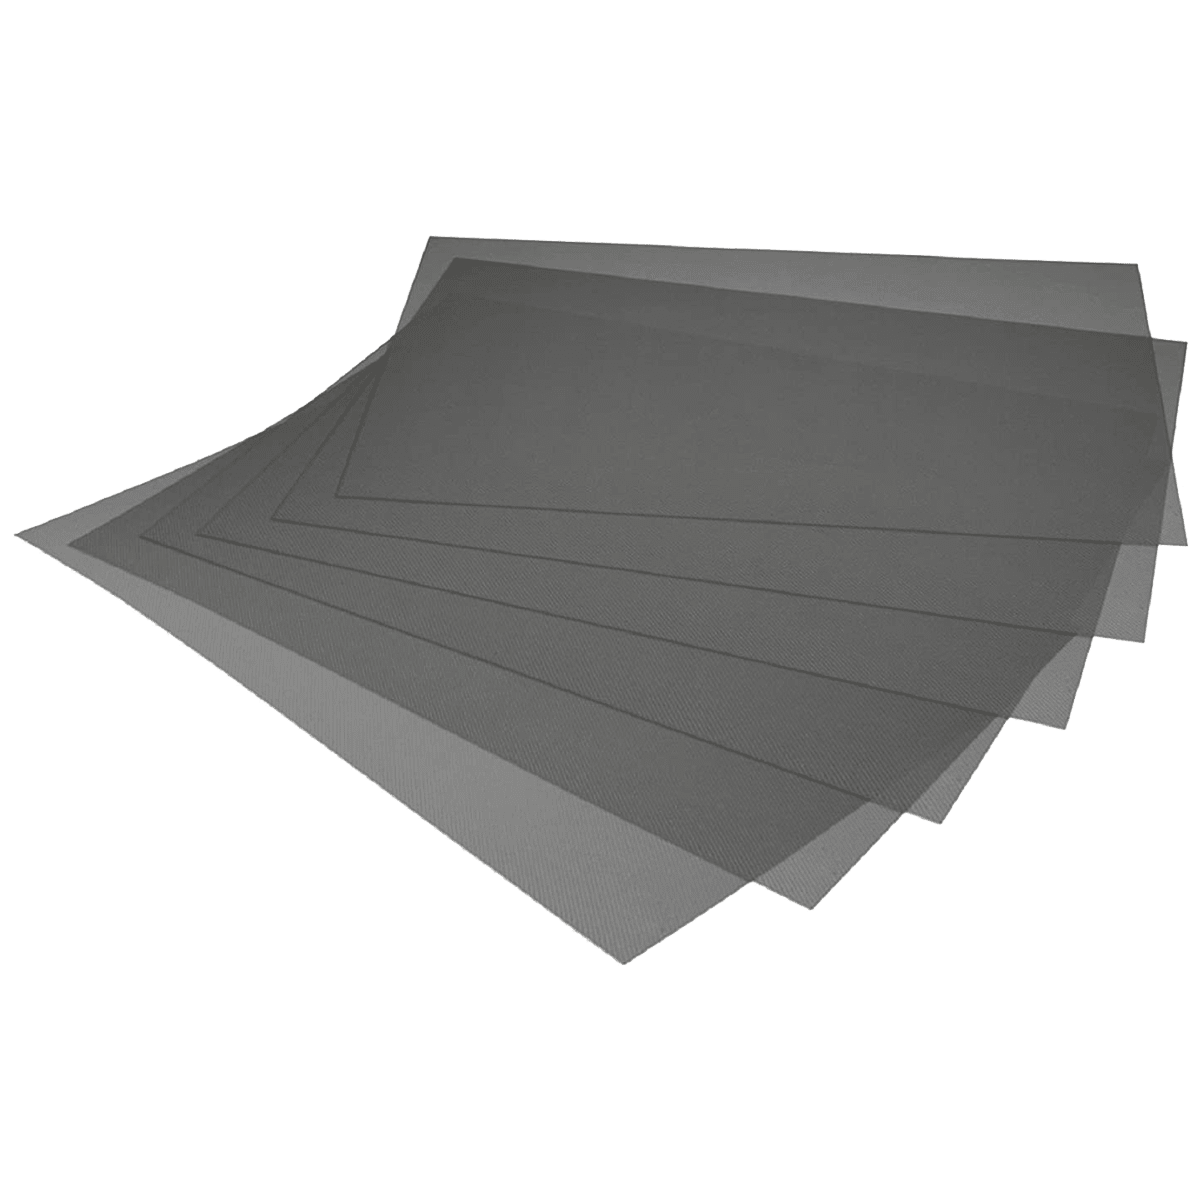 Kuber Industries Mat For Refrigerator (Multi-Purpose Mat, CTKTC032284, Black)